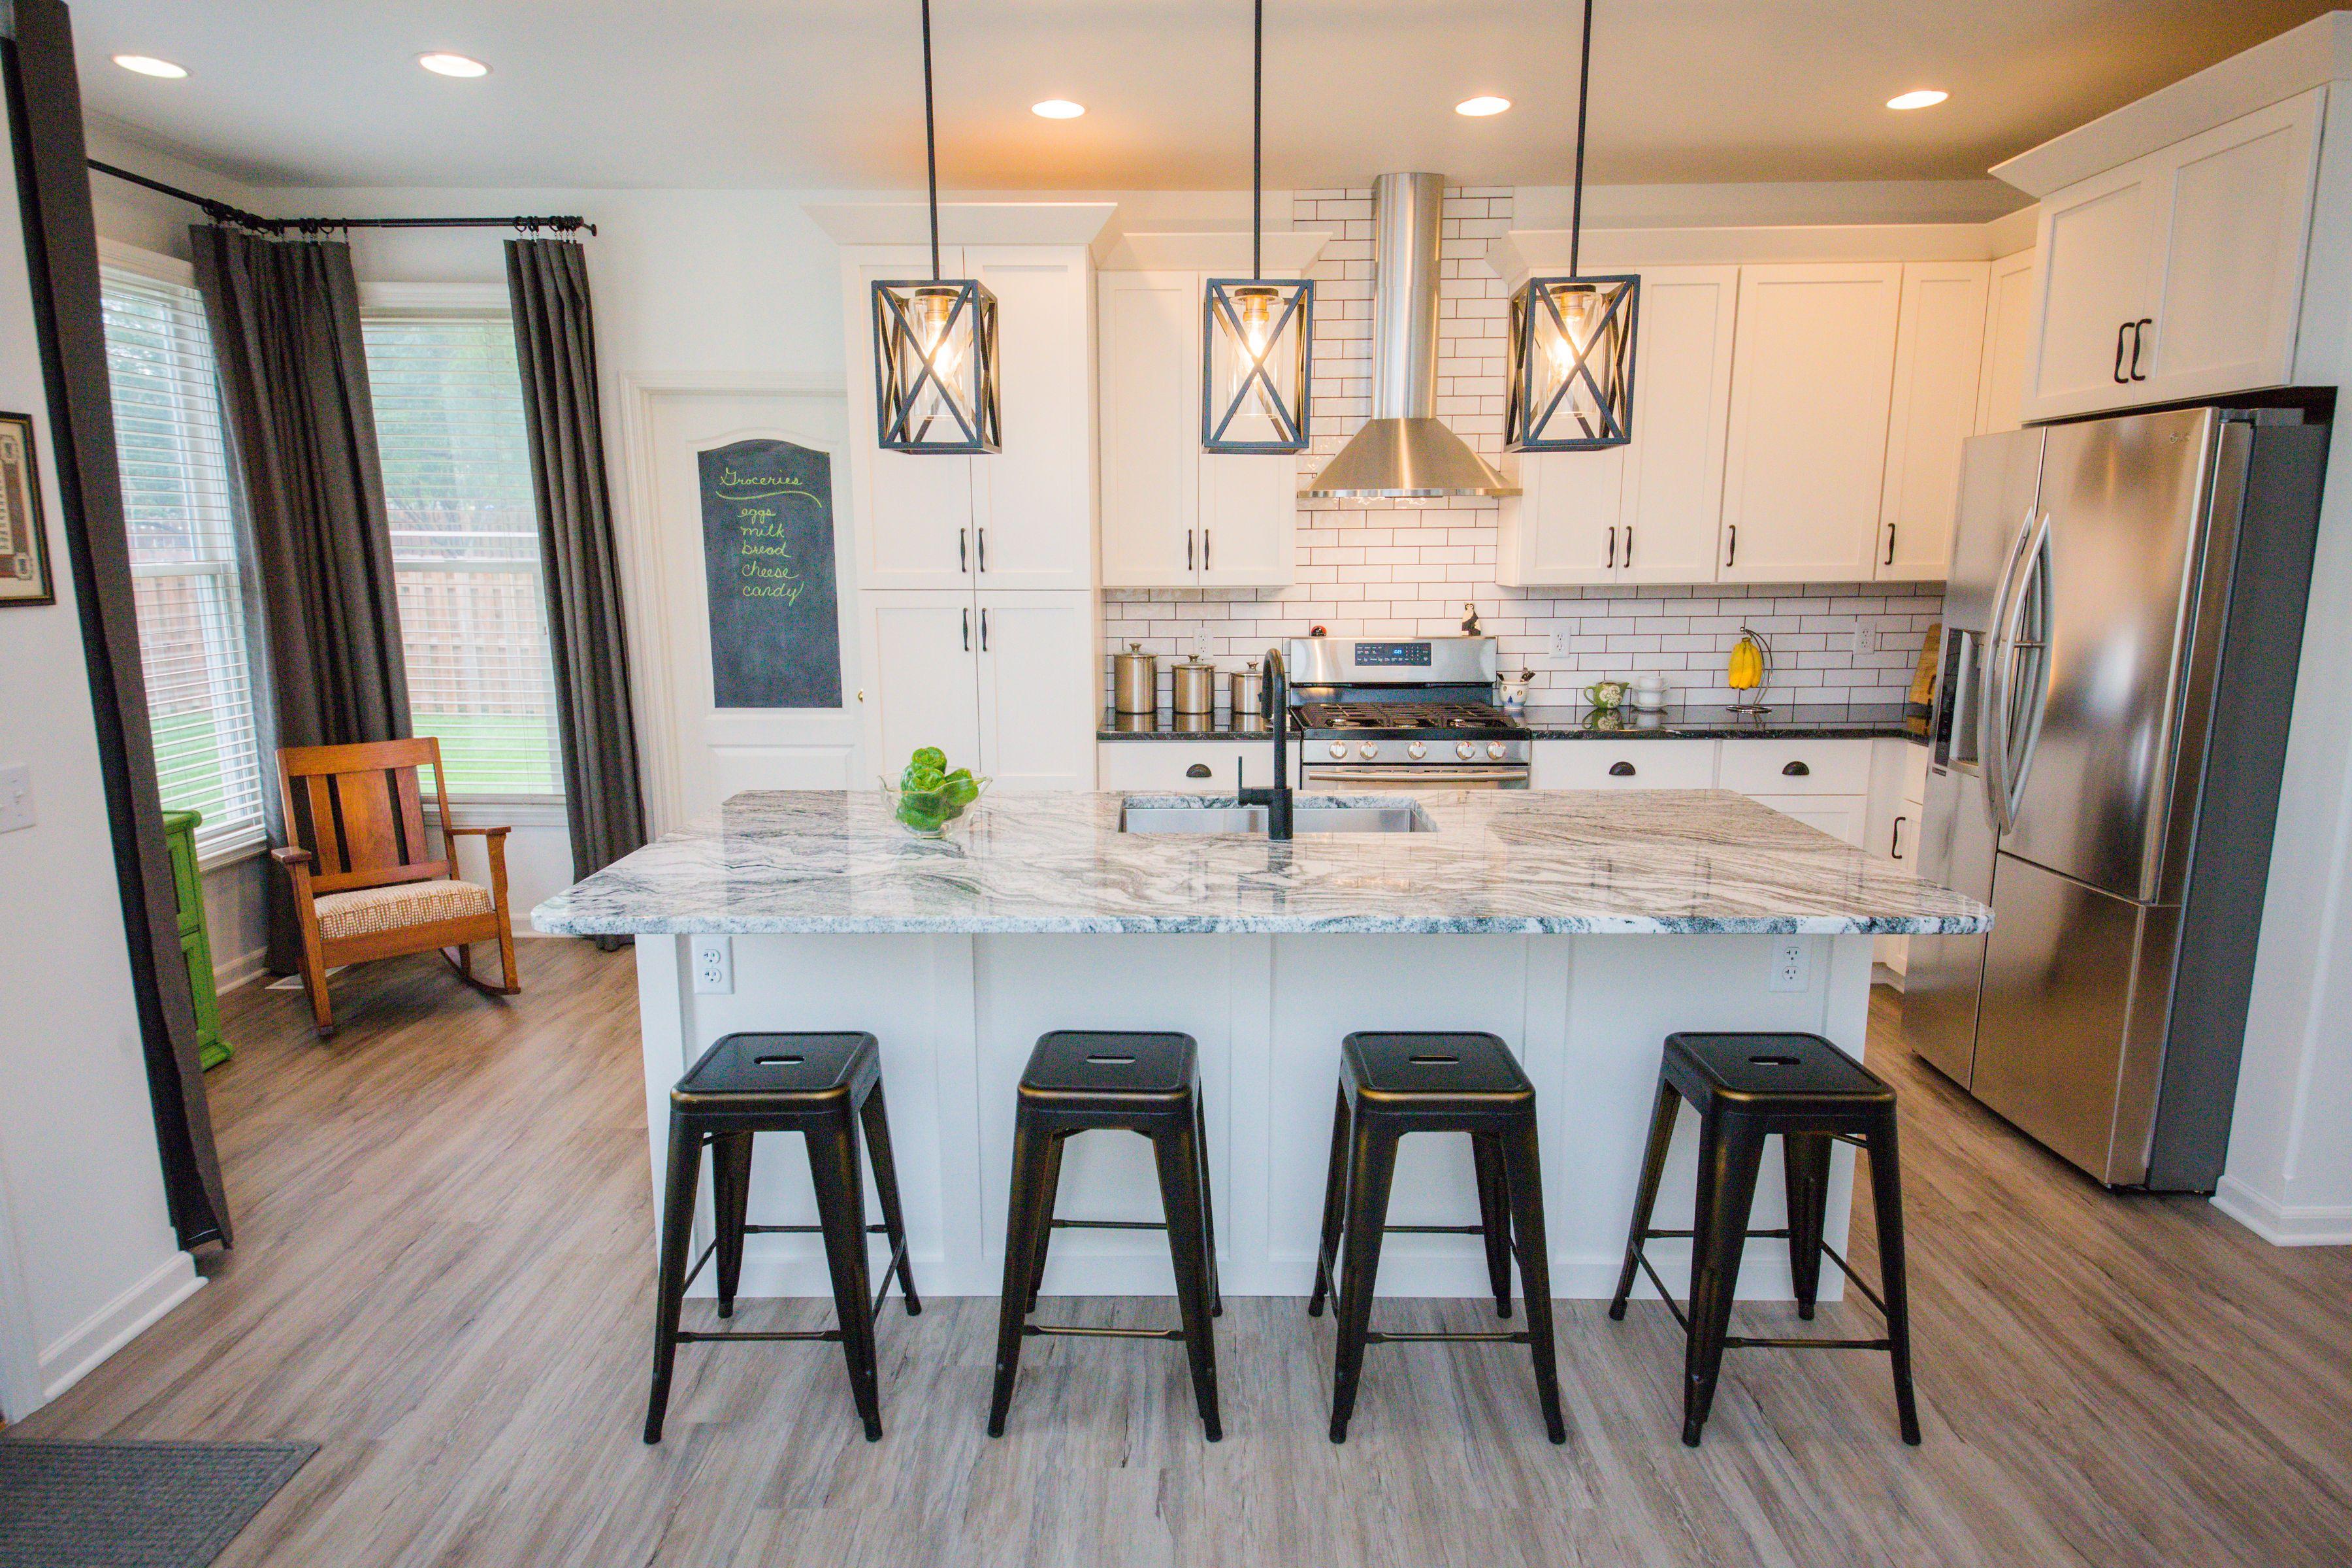 Omaha Home Improvement Contractors Basement & Kitchen